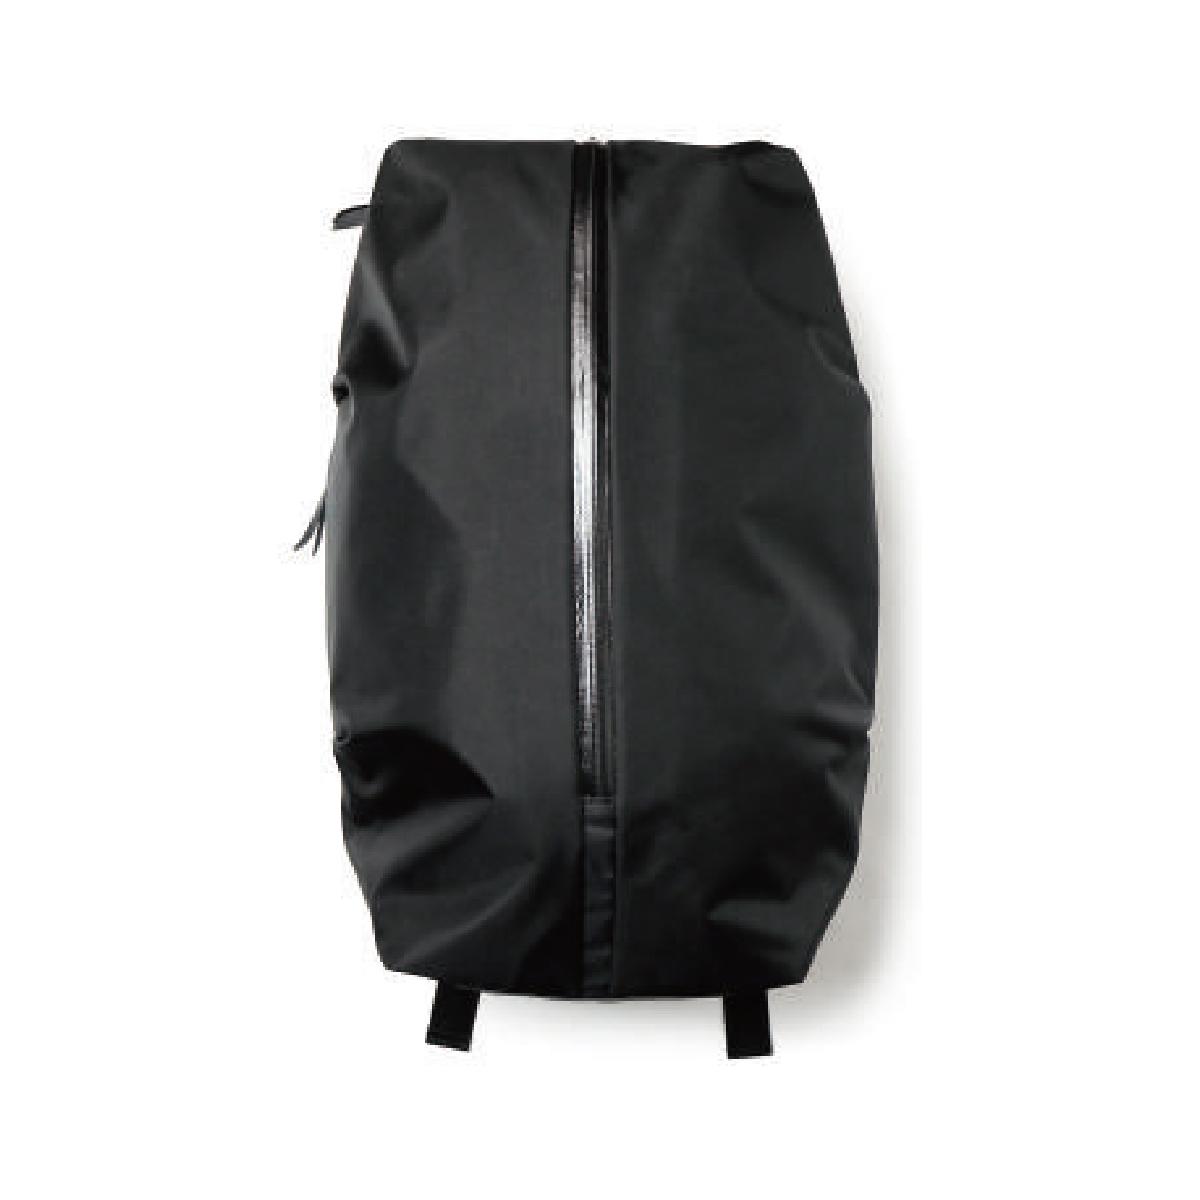 LIVERAL Egg Pack M Black series バックパック25L L1100 【日本製】 全3種 Super water repellent / Nylon 840denier / Parafin canvas